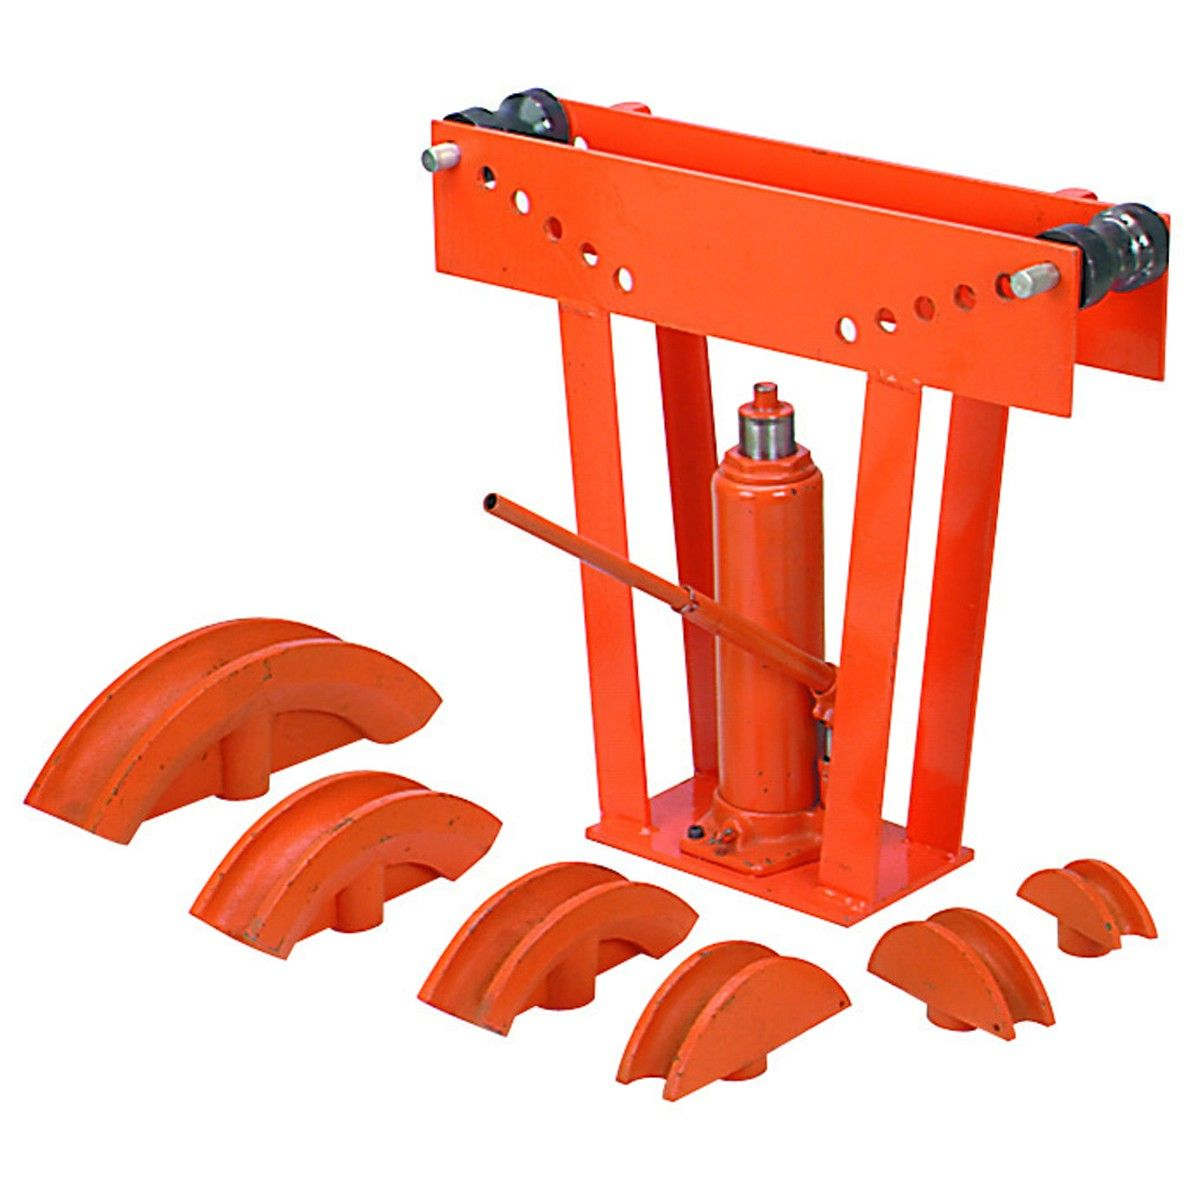 High Quality 12Ton Hydraulic Manual Pipe Bender 6 Dies Tubing Tube Bending Red